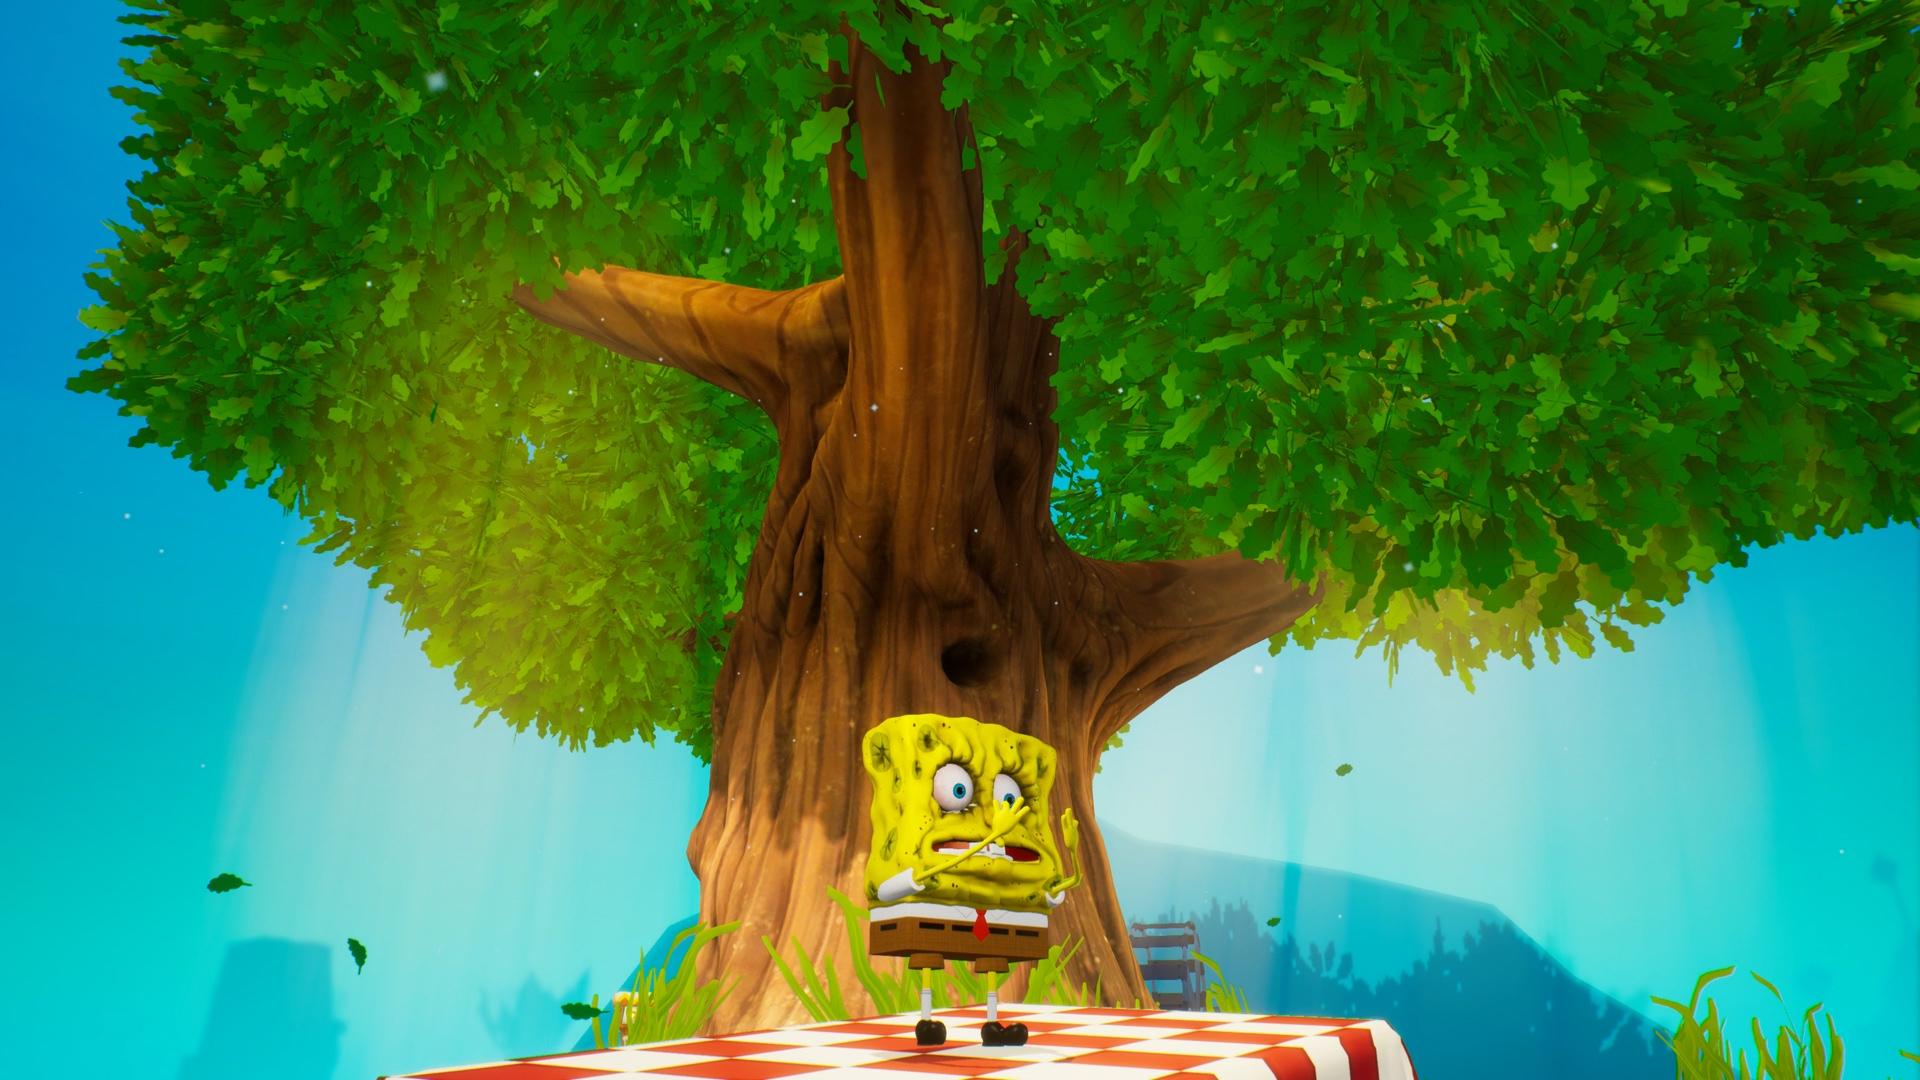 SpongeBob review locations